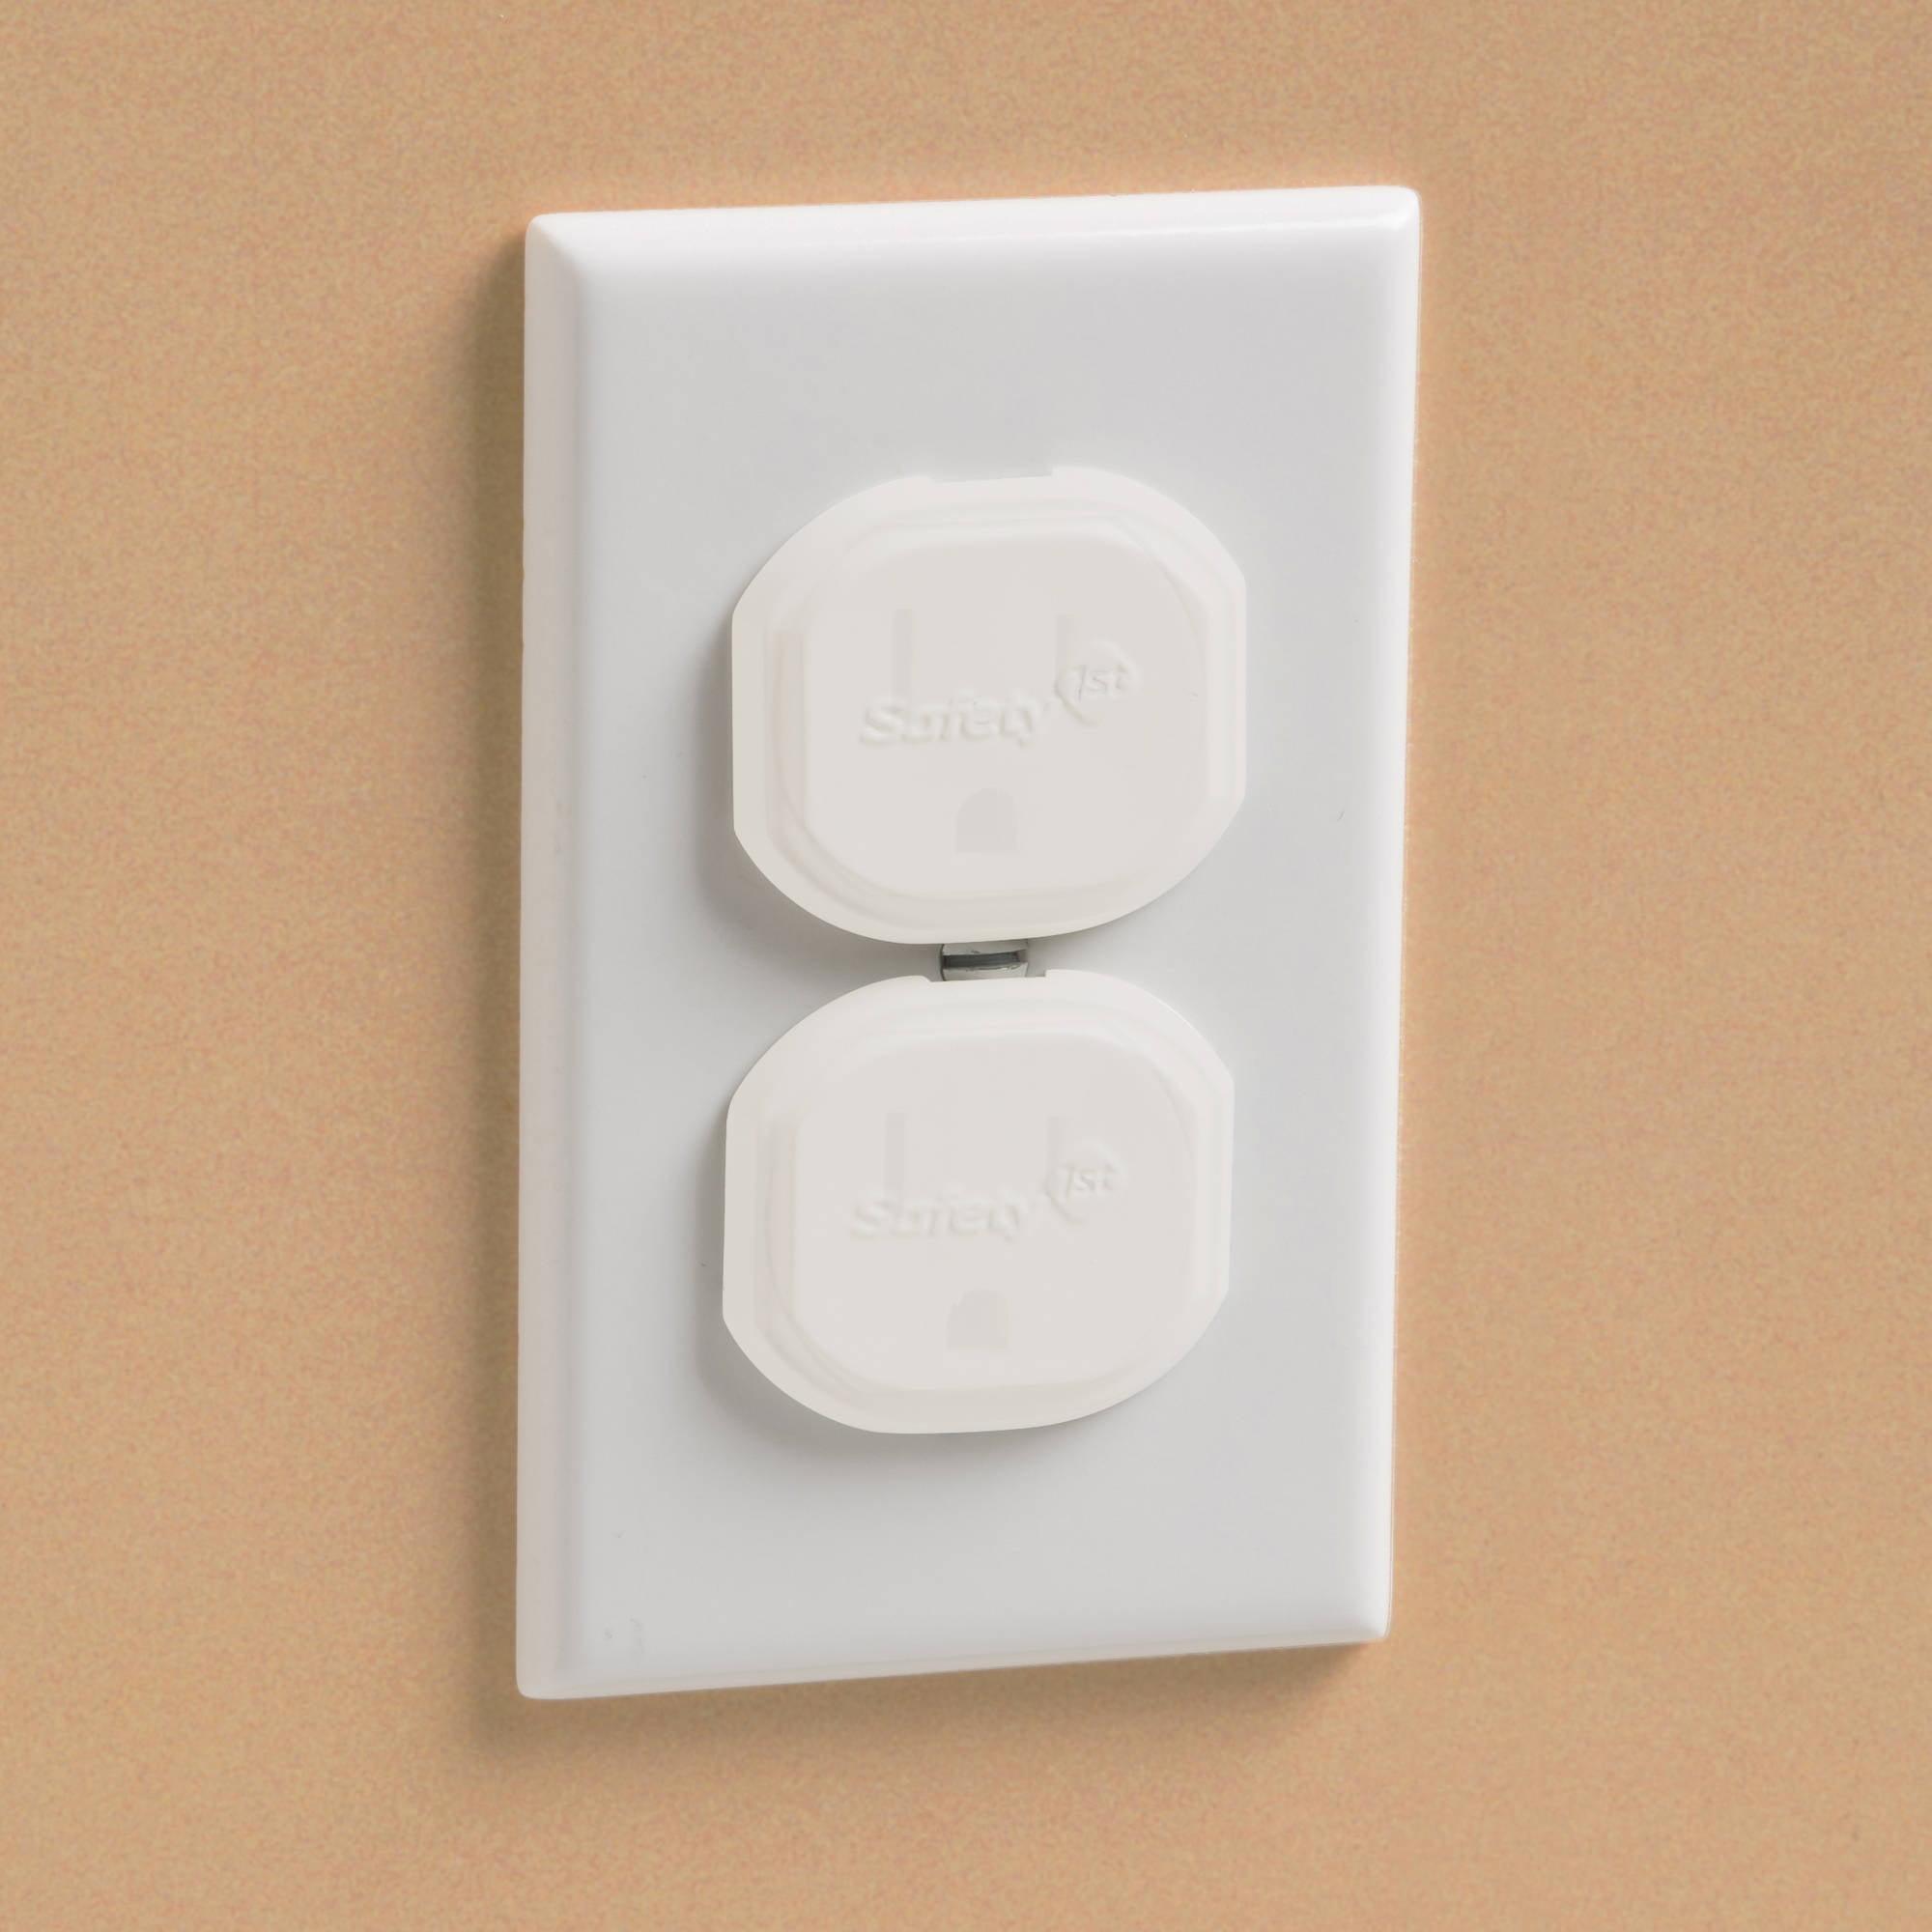 babyproofing walmart com safety 1st plug protectors 24 pack